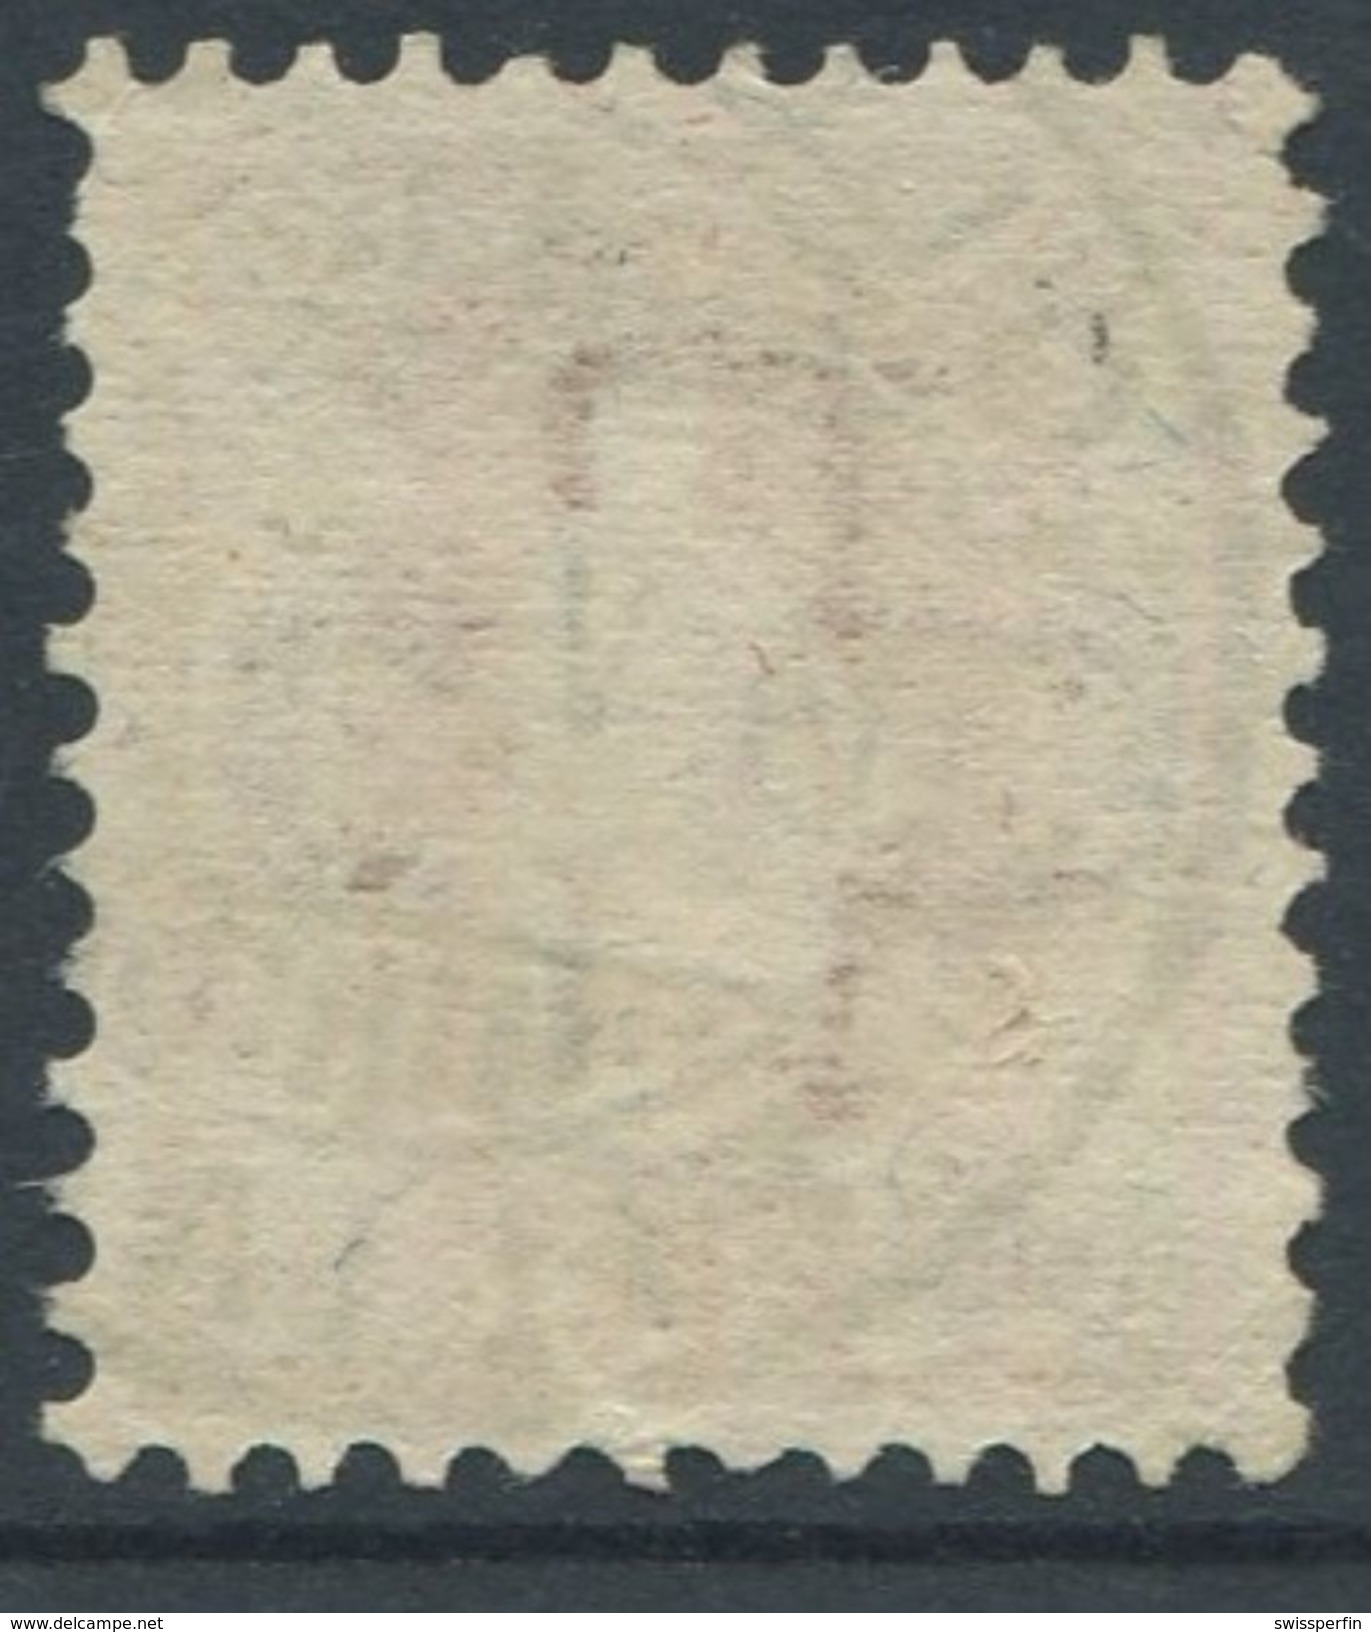 1648 - 30 Rp. Stehende Helvetia (Faser) Mit Vollstempel SOLOTHURN 14.V.08 - SBK Katalogwert CHF 650.00 - 1882-1906 Armoiries, Helvetia Debout & UPU